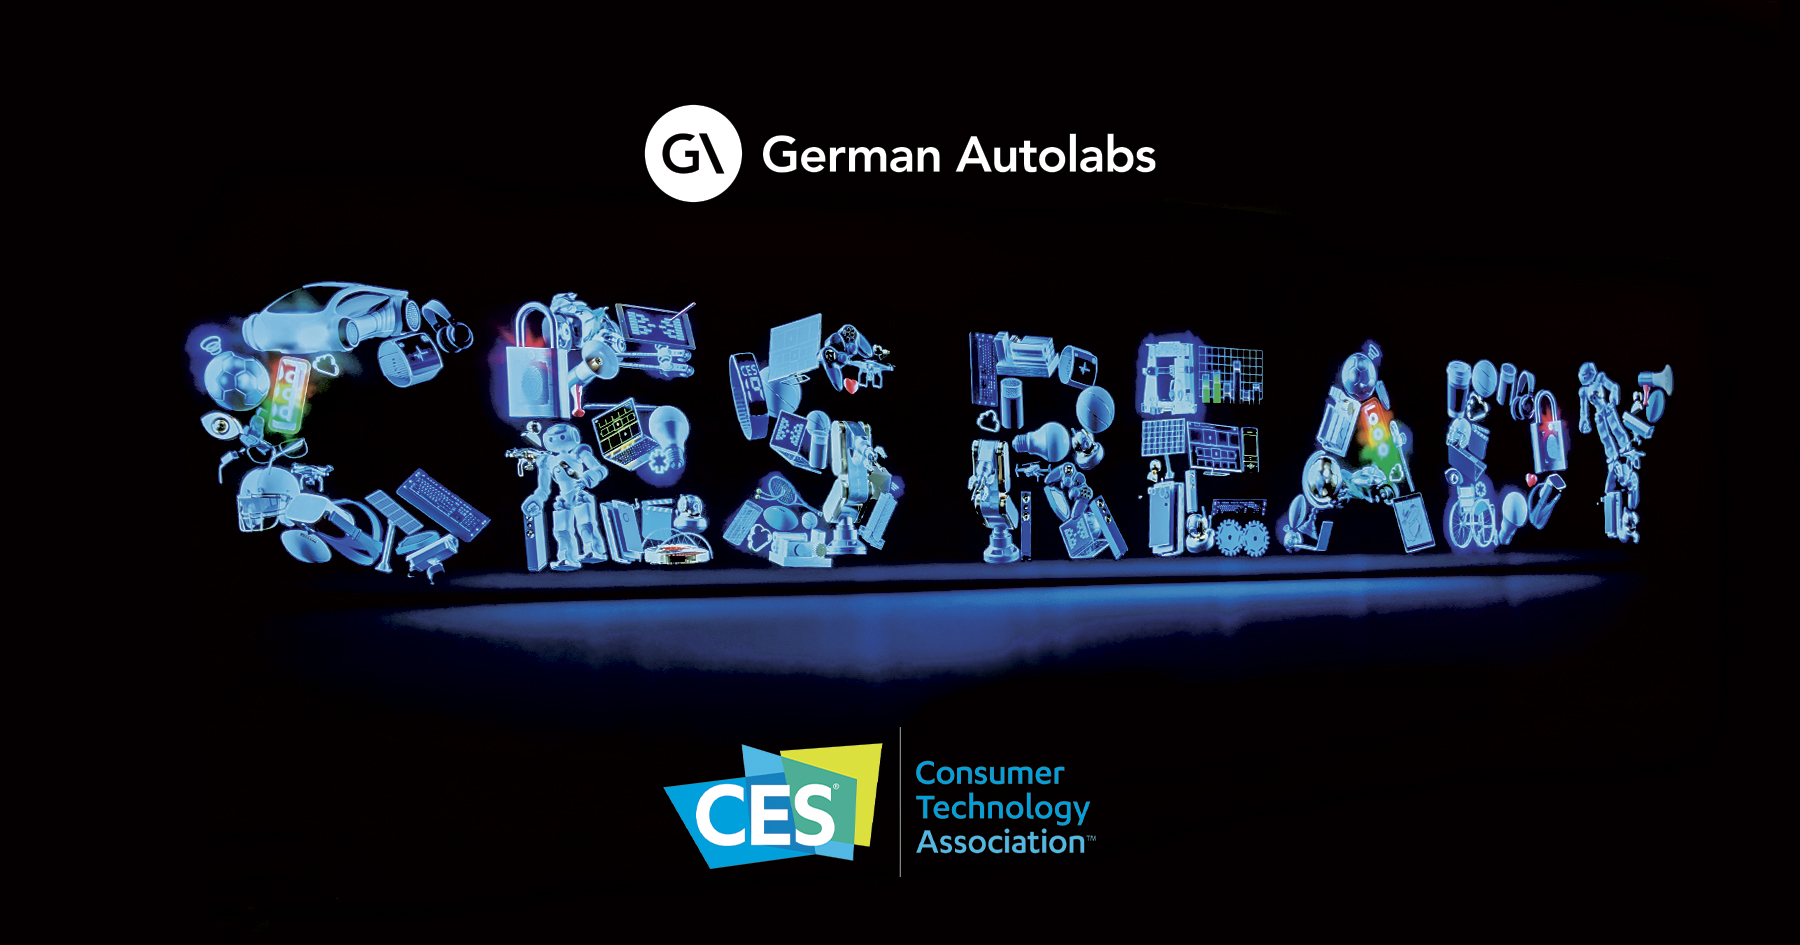 German Autolabs at CES 2019 in Las Vegas